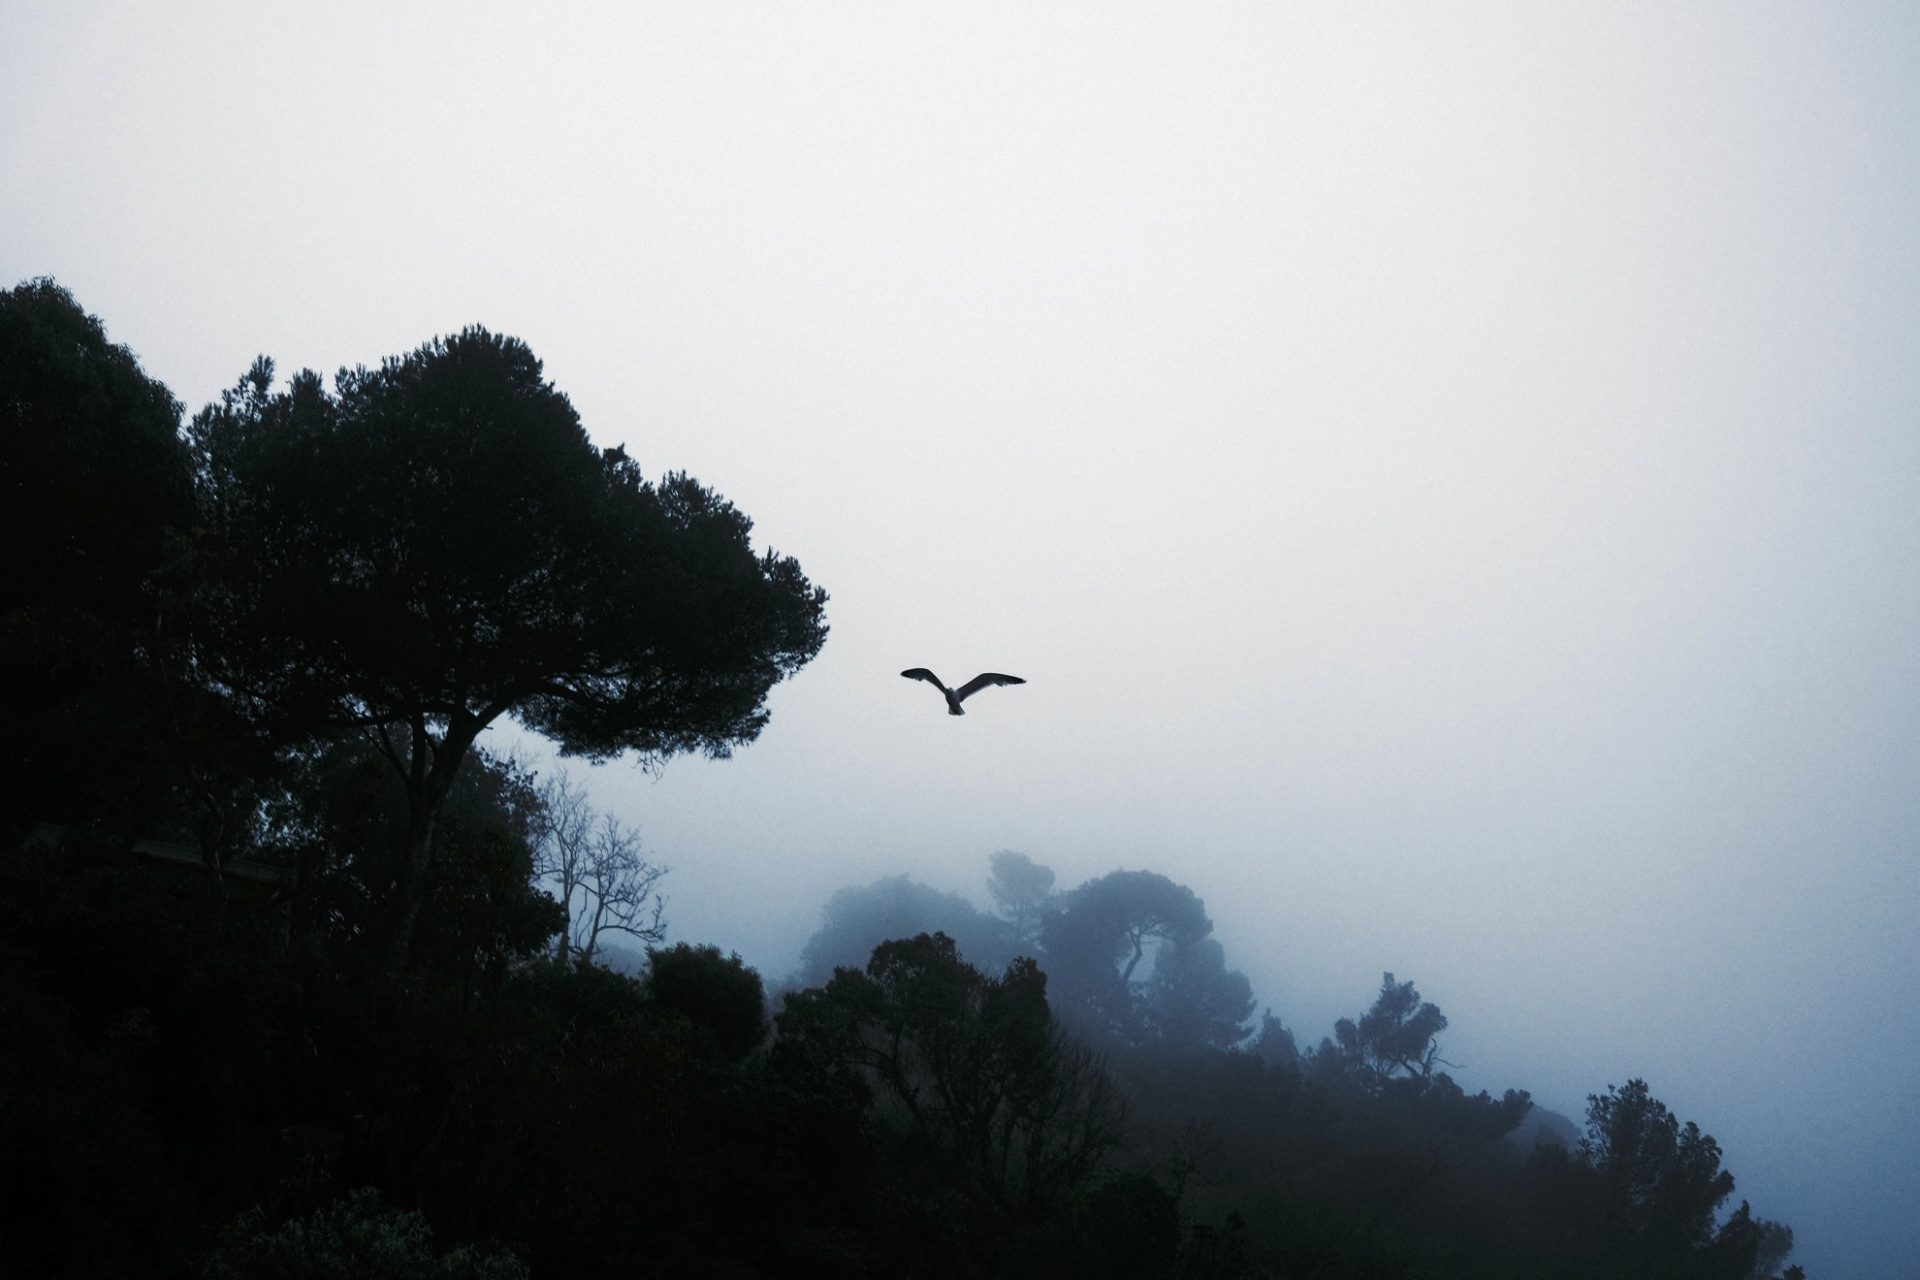 Fuji X100v pin de galle fog @laurentparienti-6